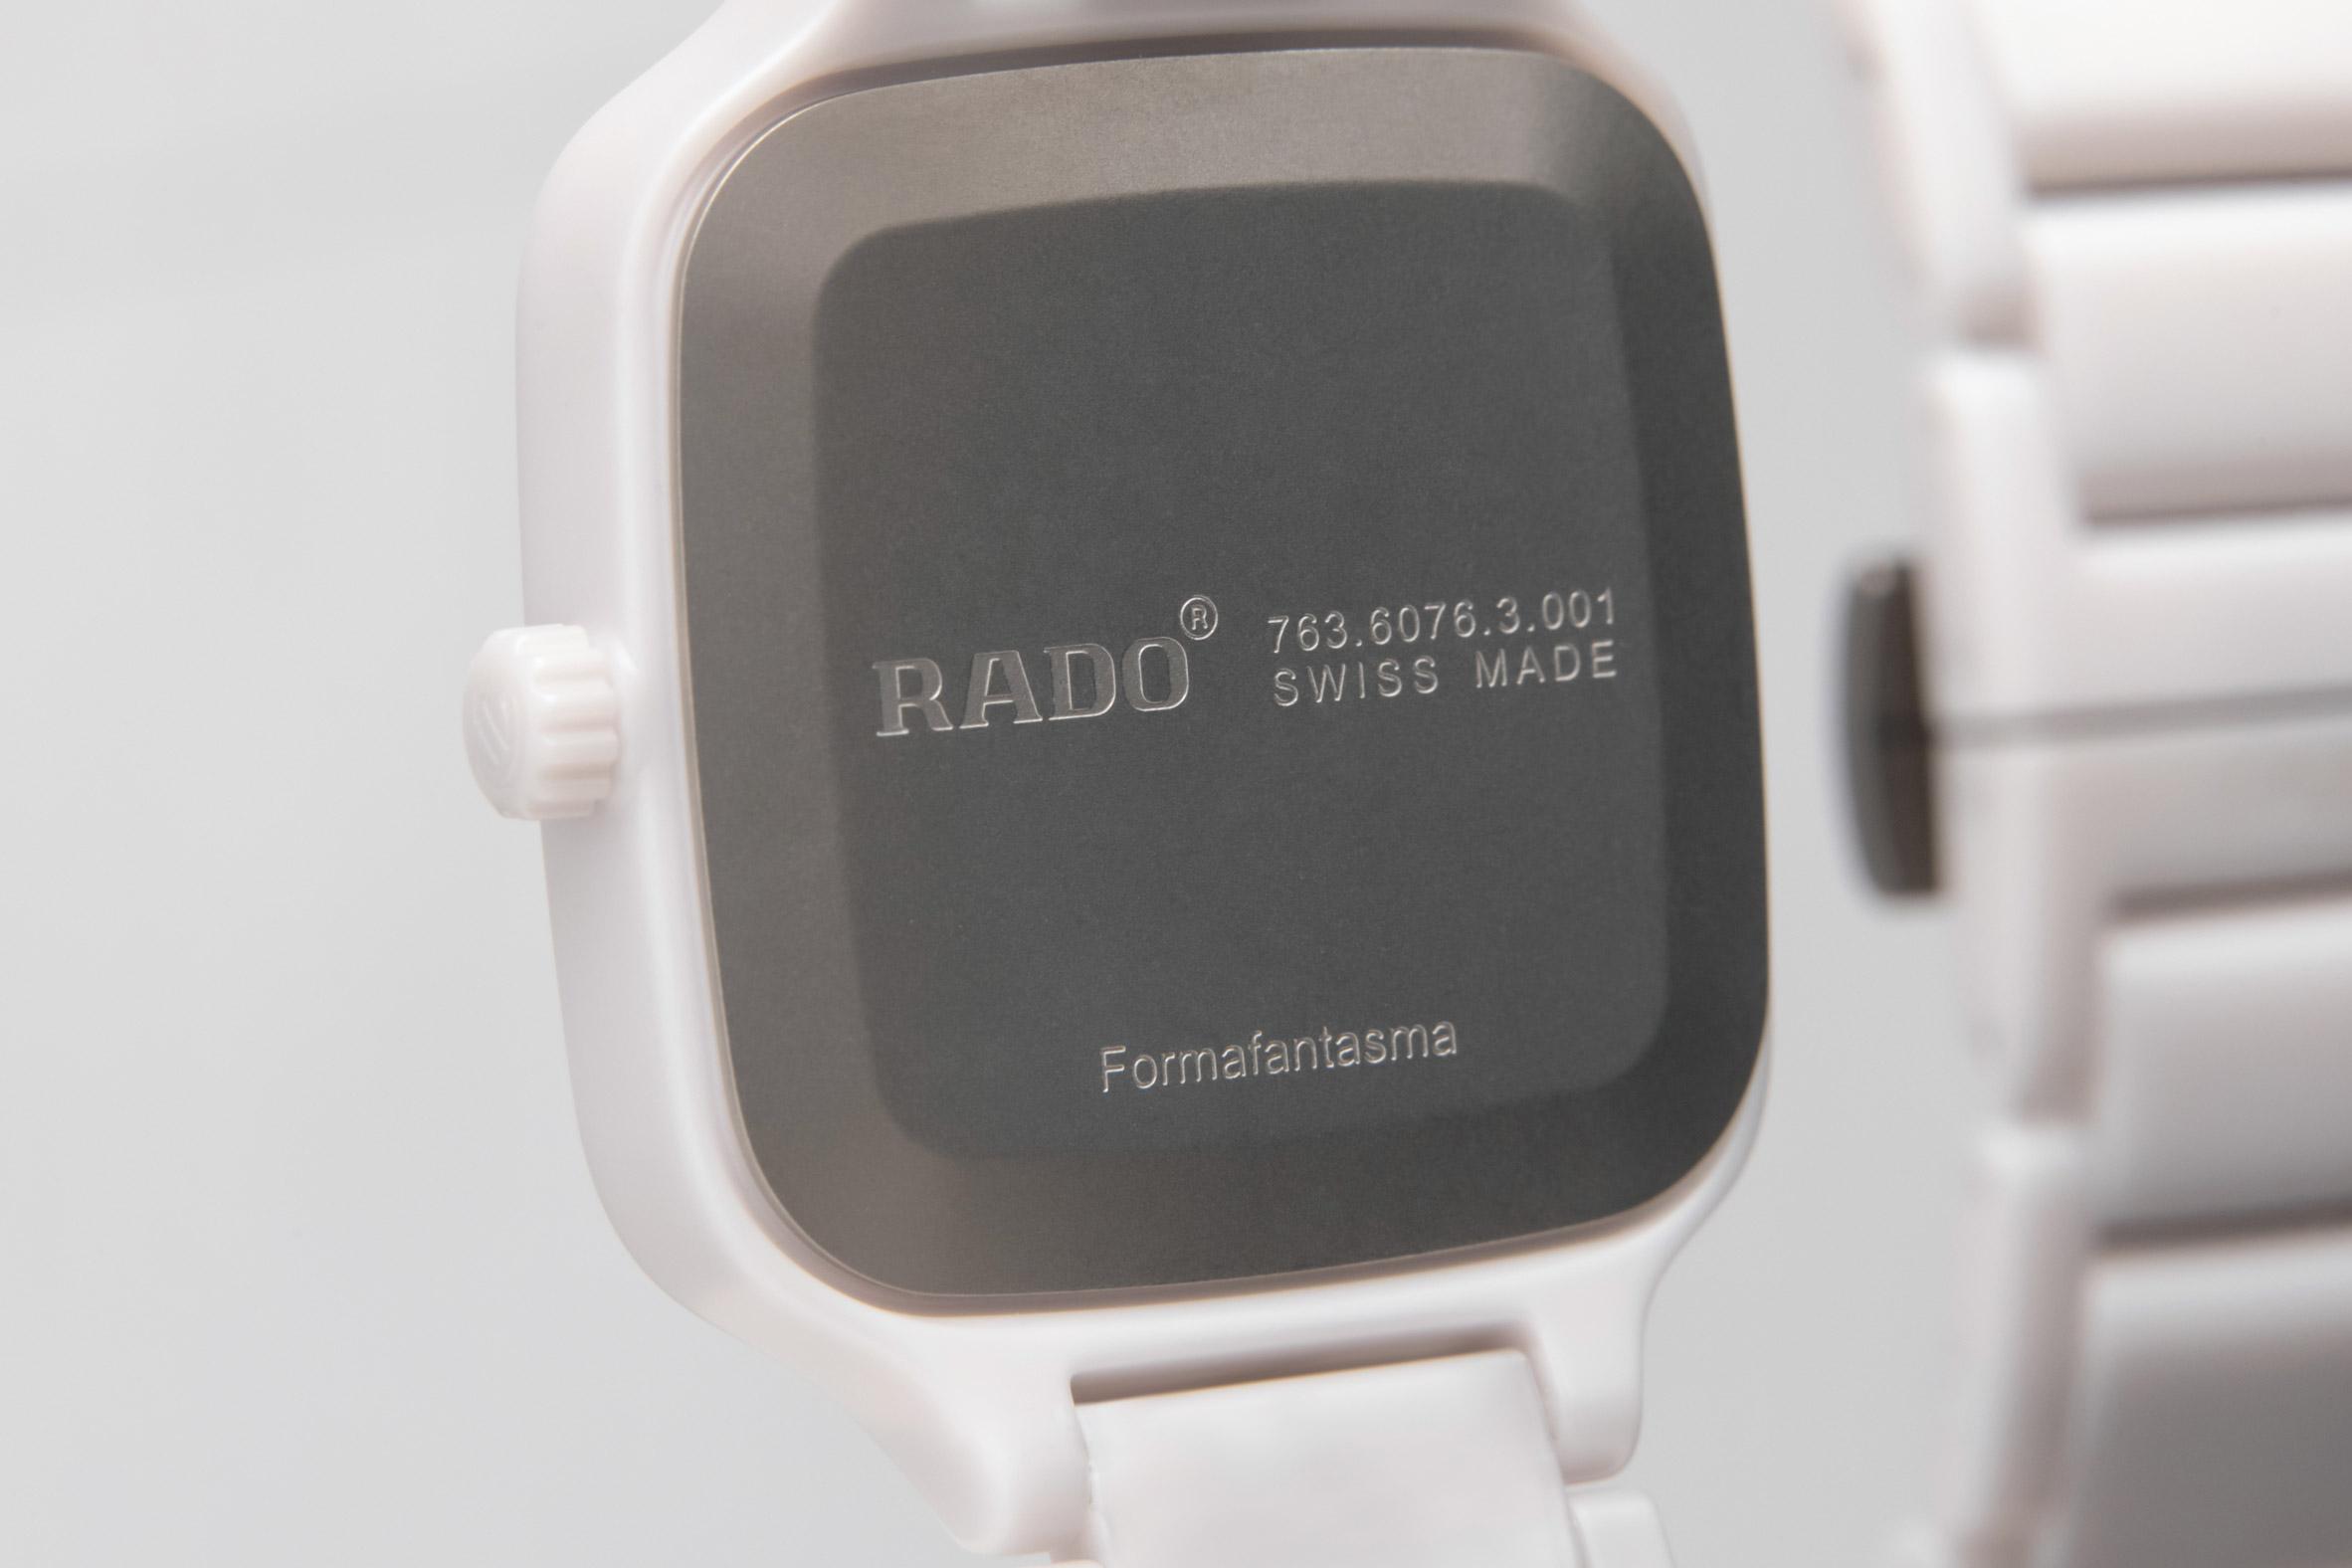 True Square FormaFantasma for Rado